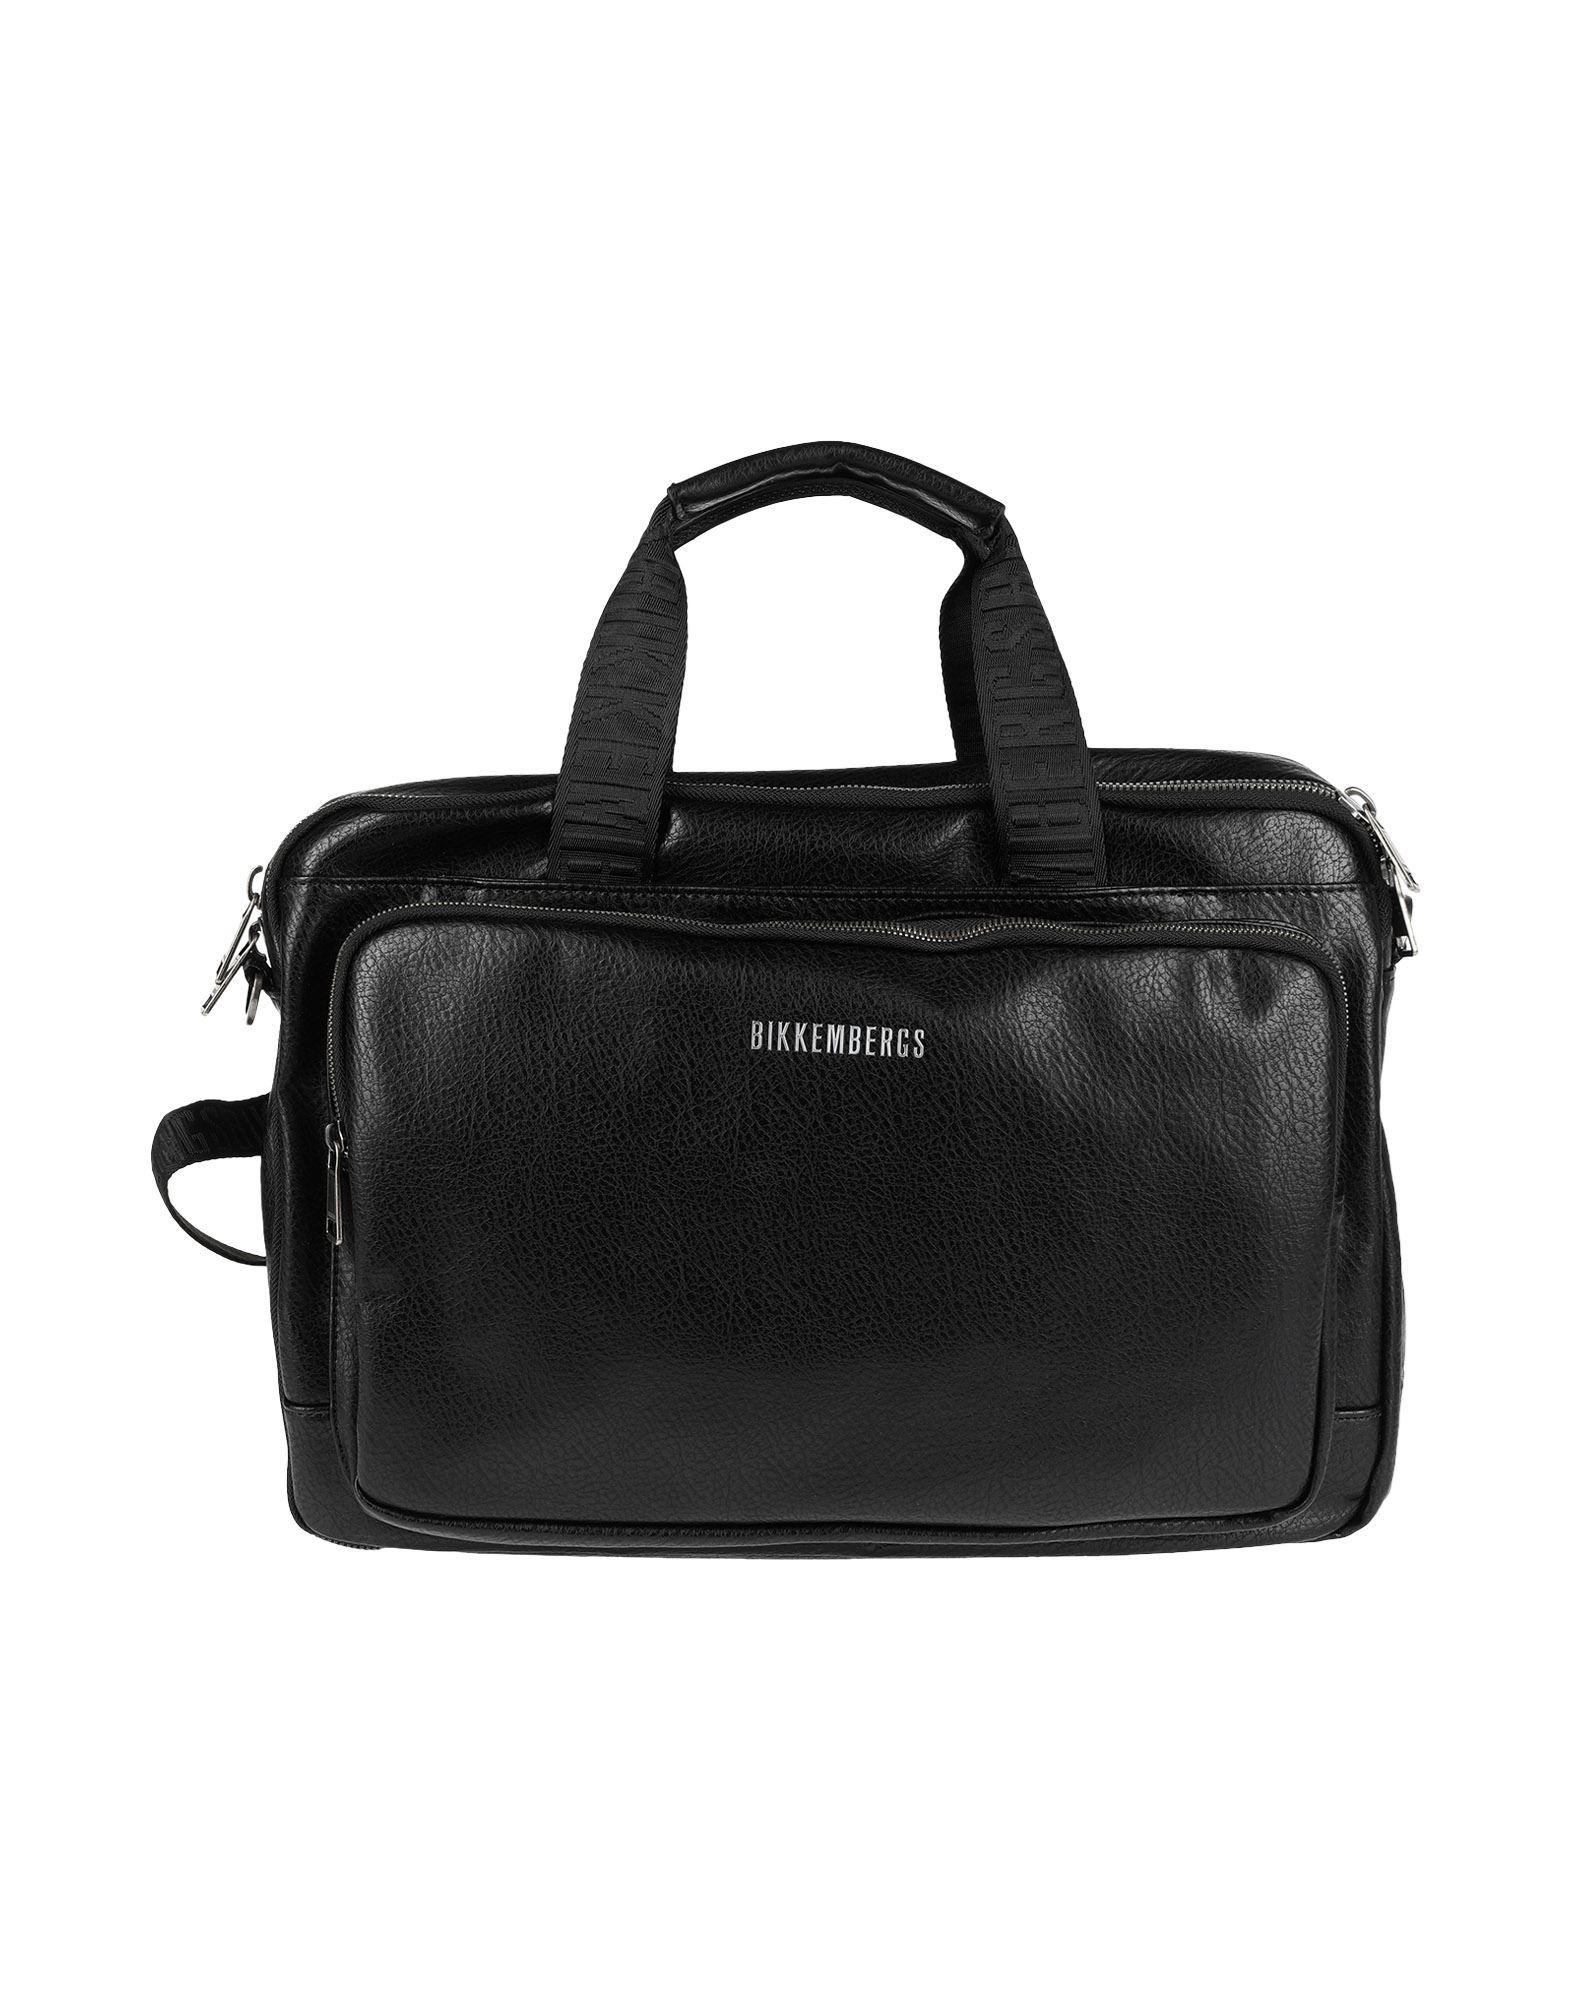 bikkembergs деловые сумки BIKKEMBERGS Деловые сумки